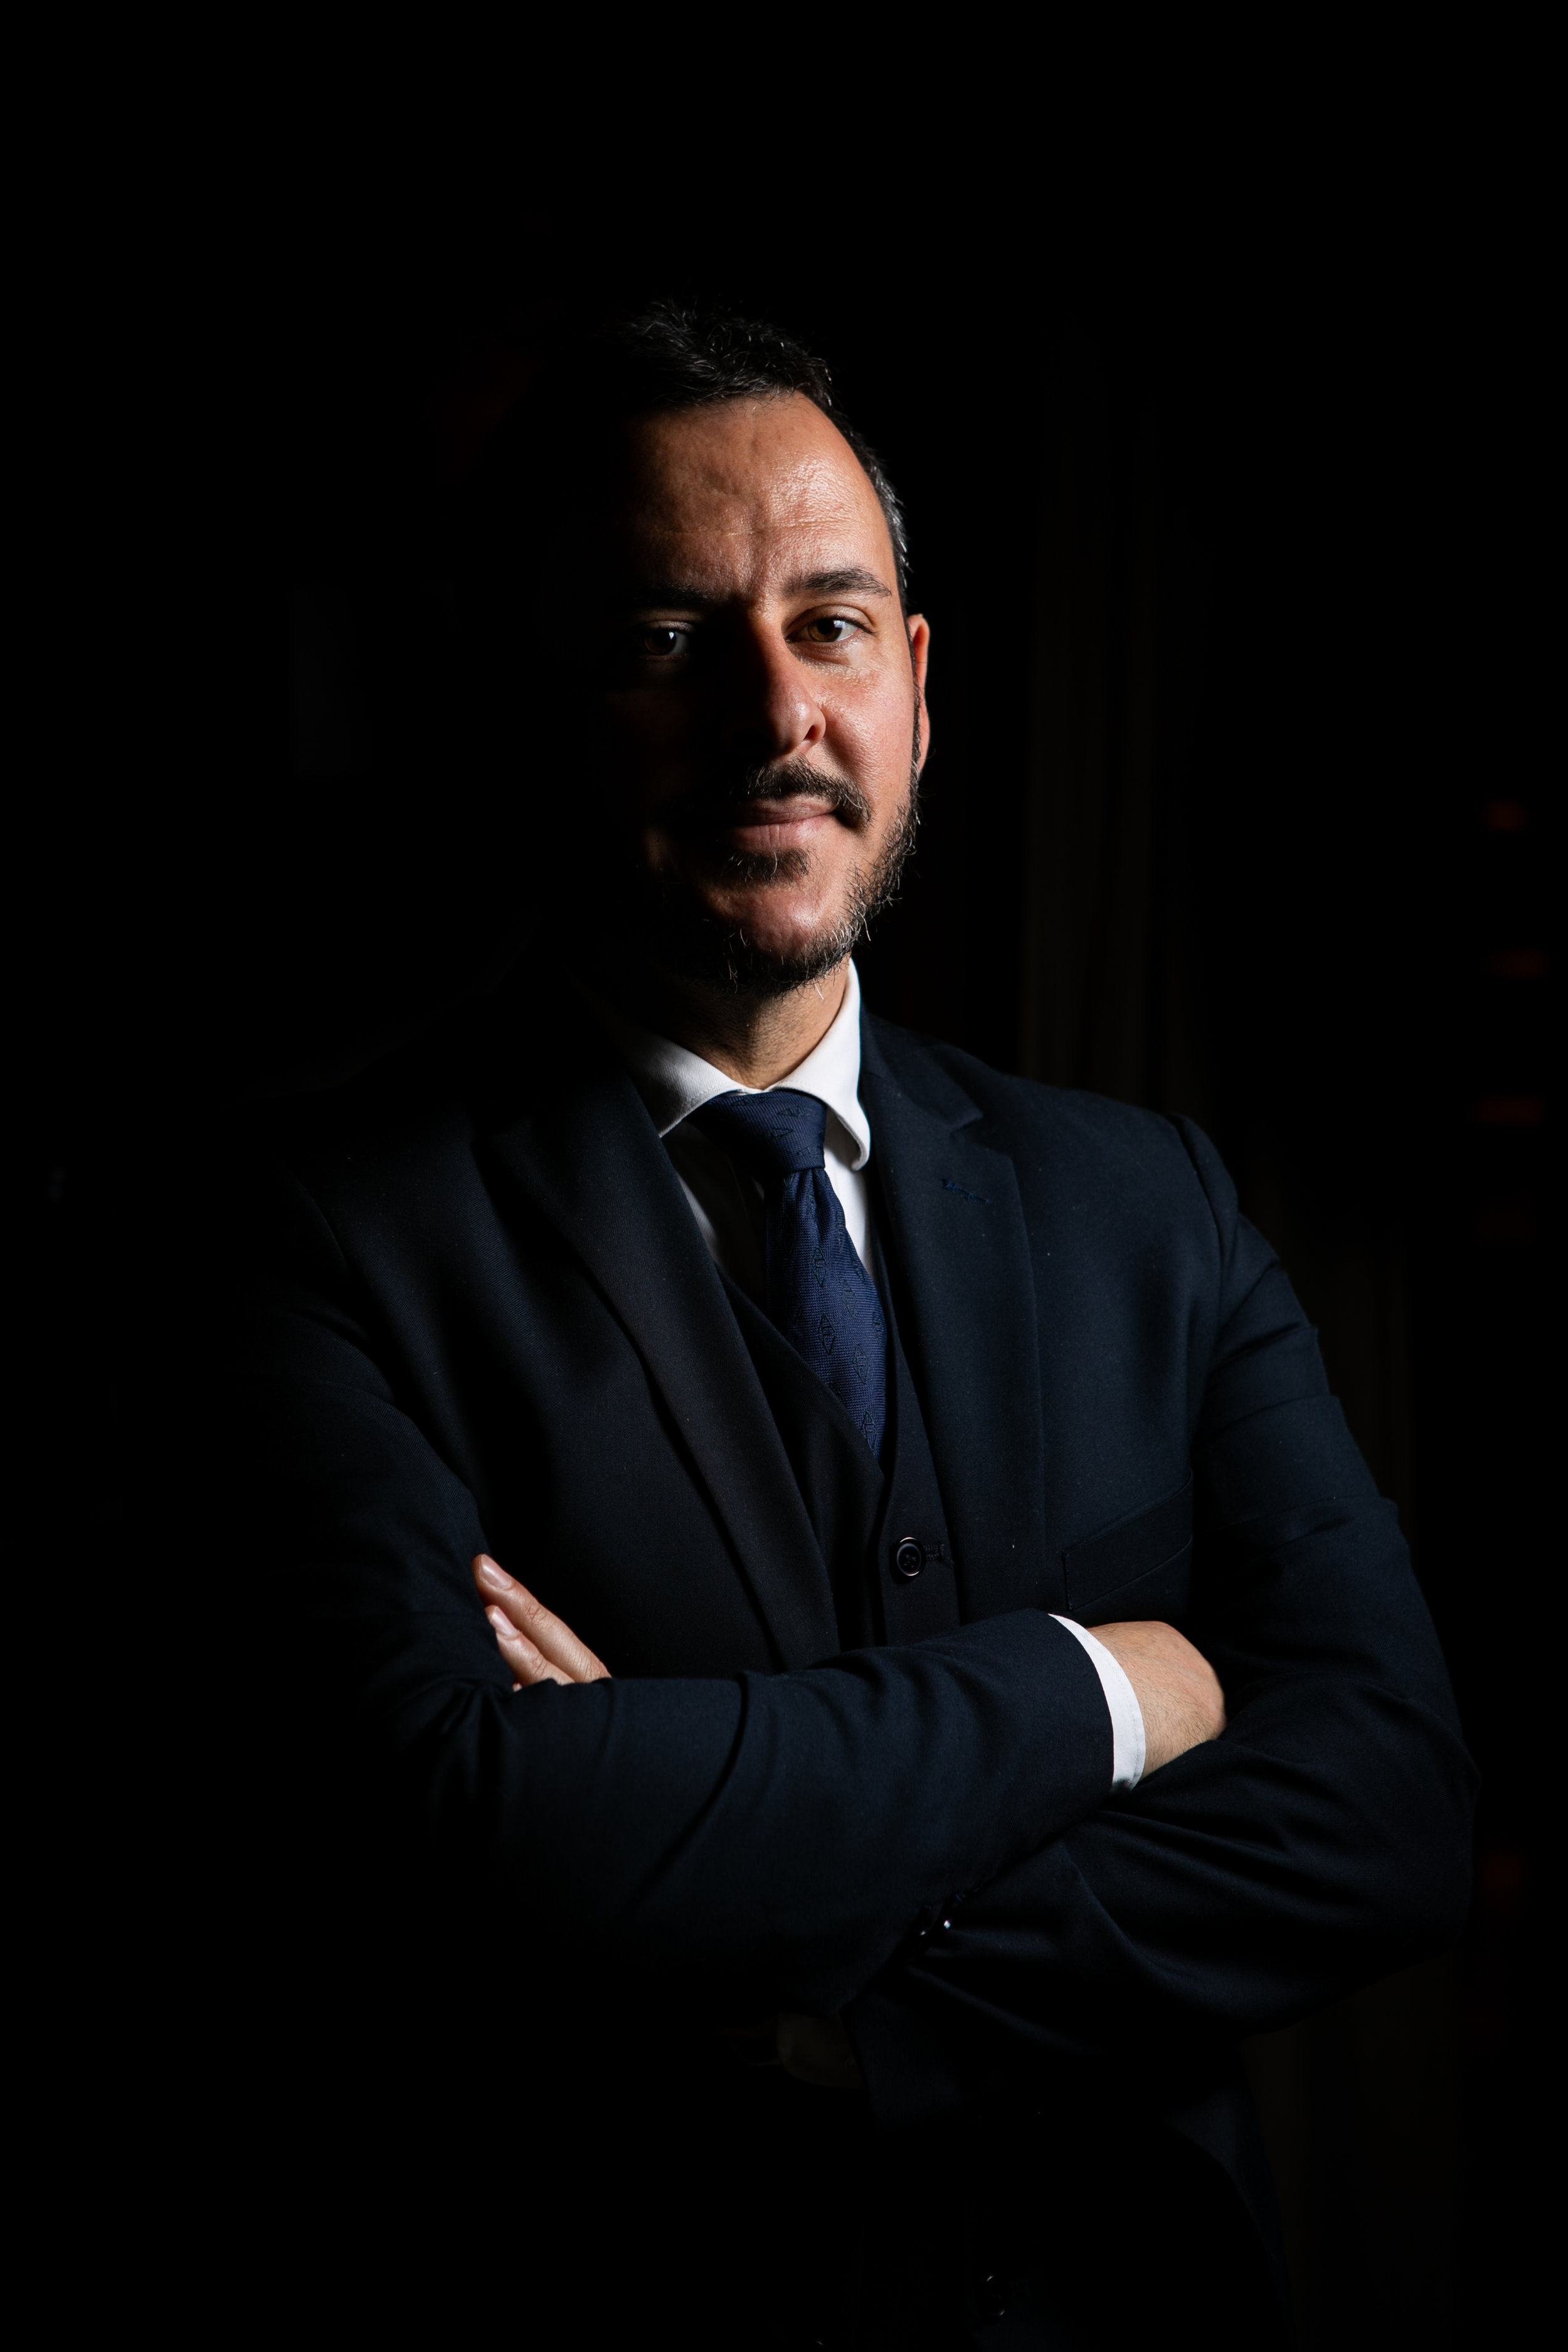 Rudy Travagli, Enoteca La Torre (C/O Aromi)